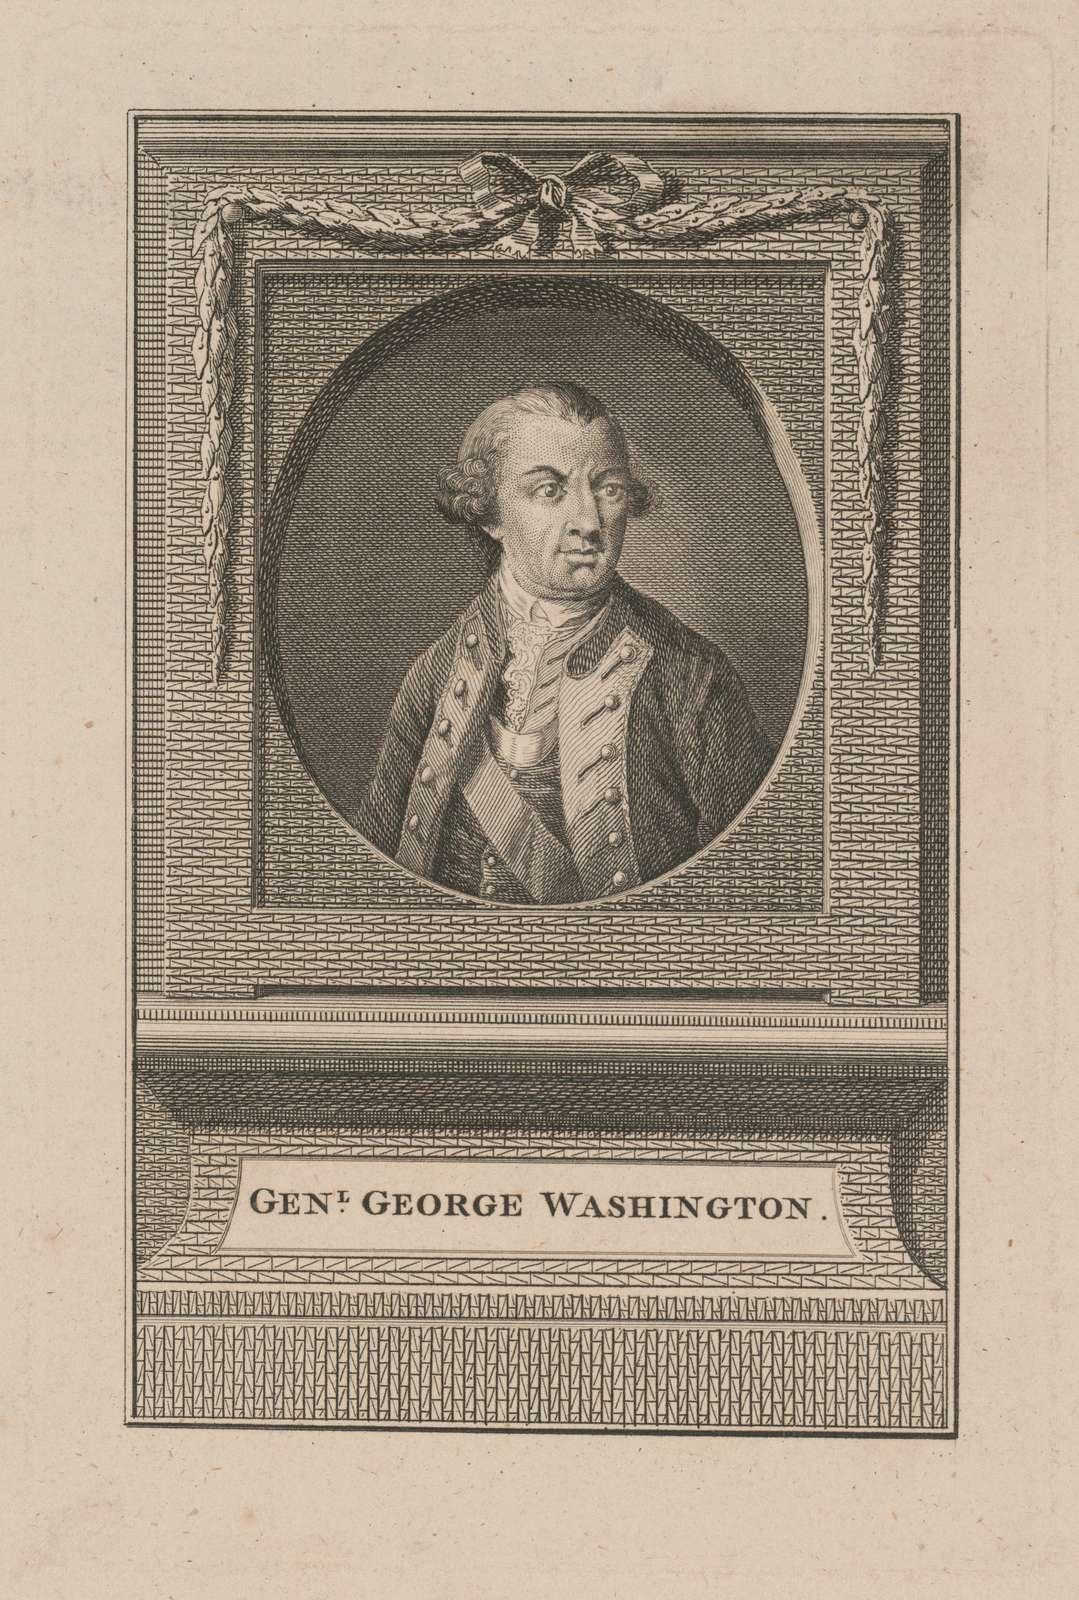 Gen'l. George Washington